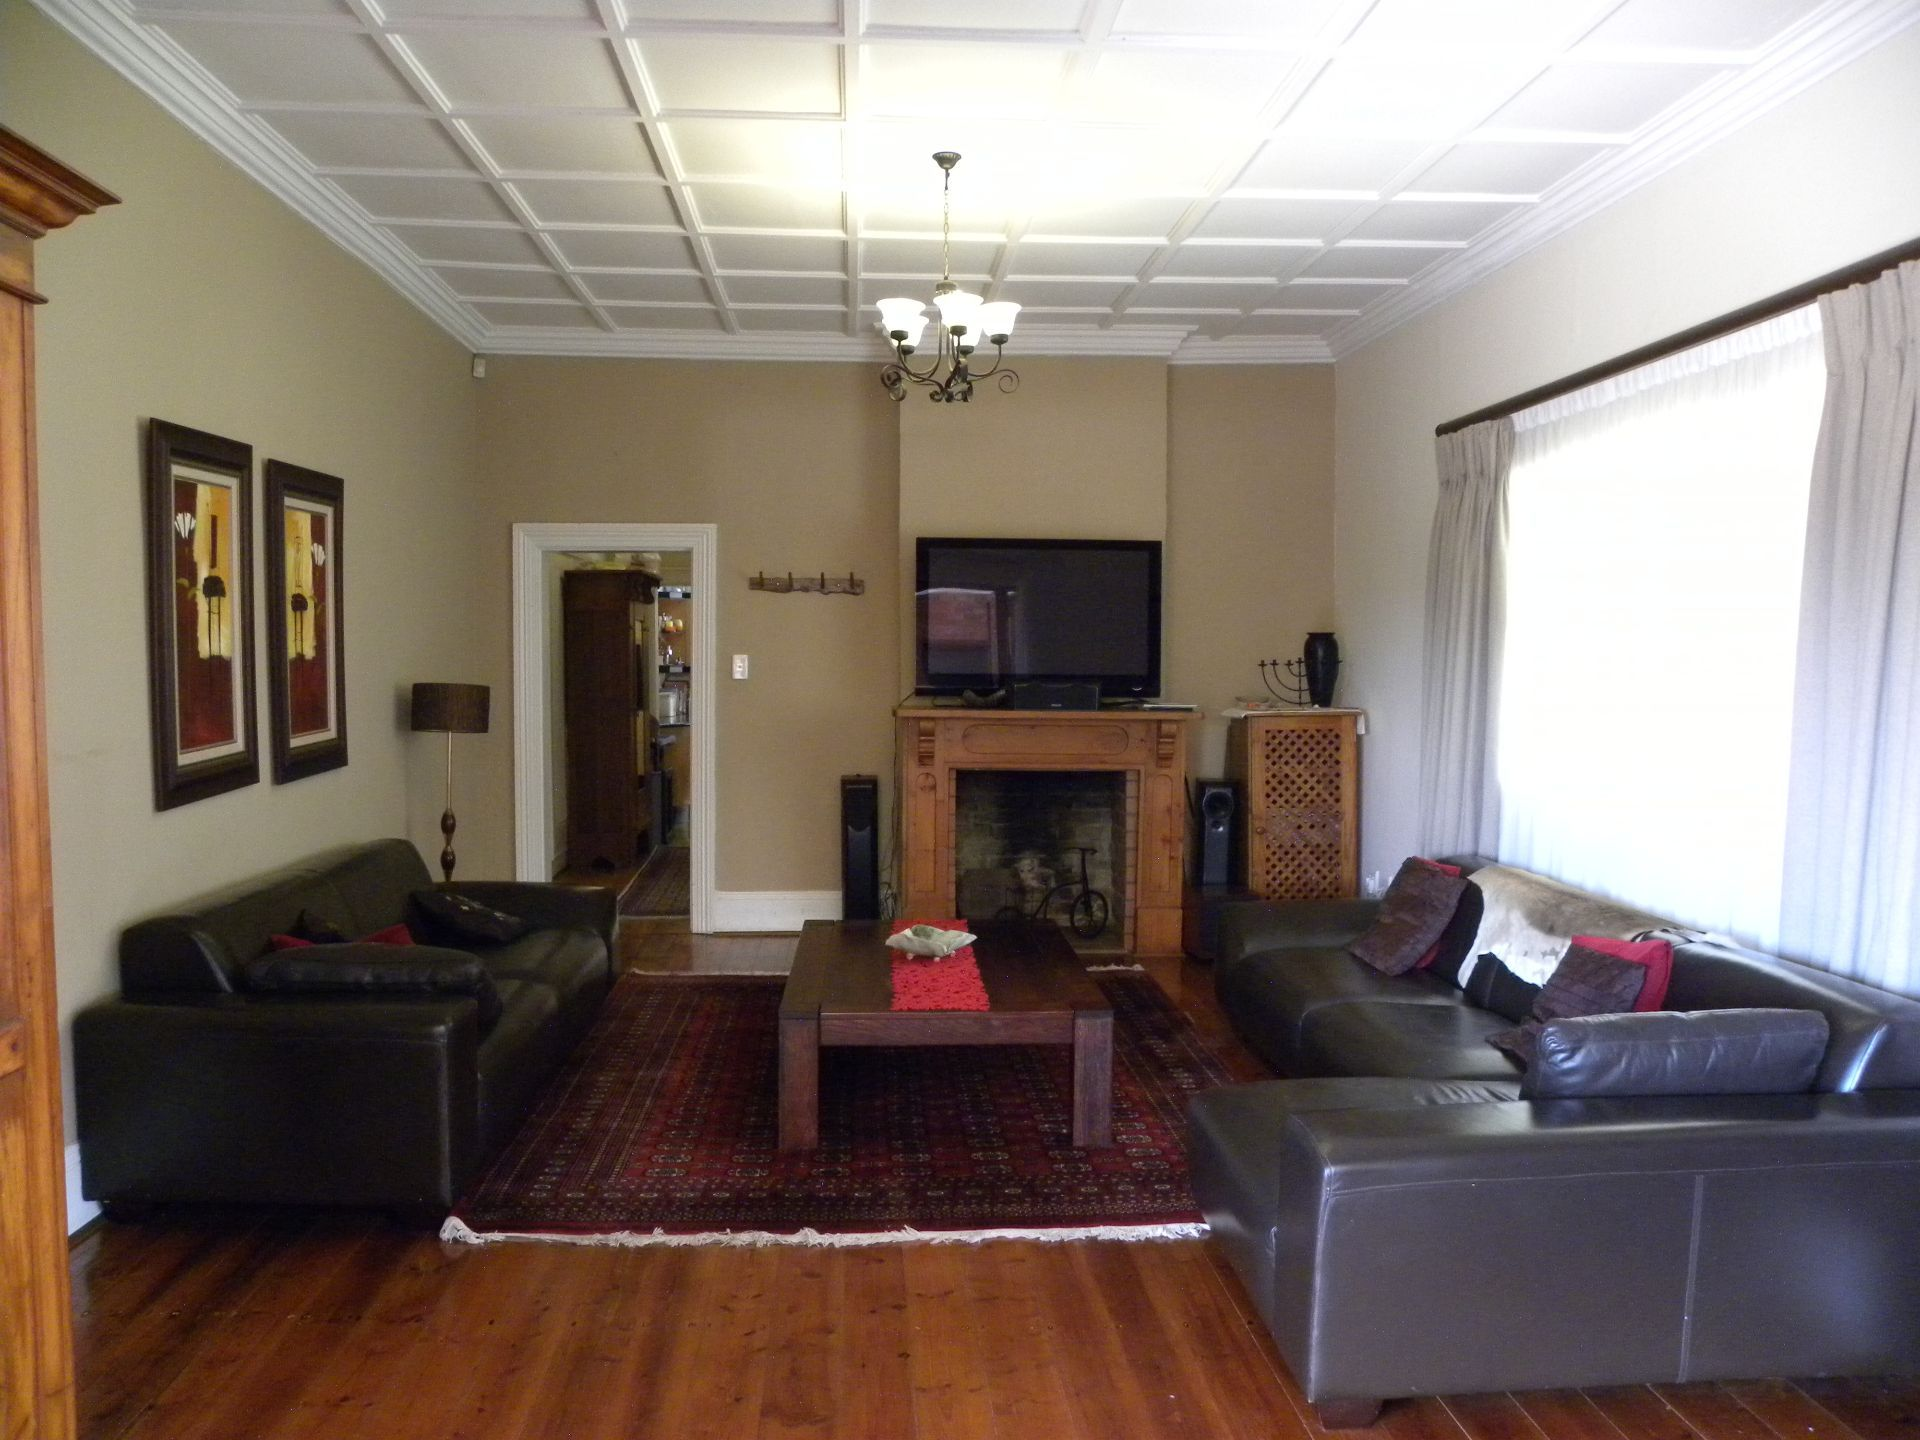 Bonnie Doone property for sale. Ref No: 13229687. Picture no 9